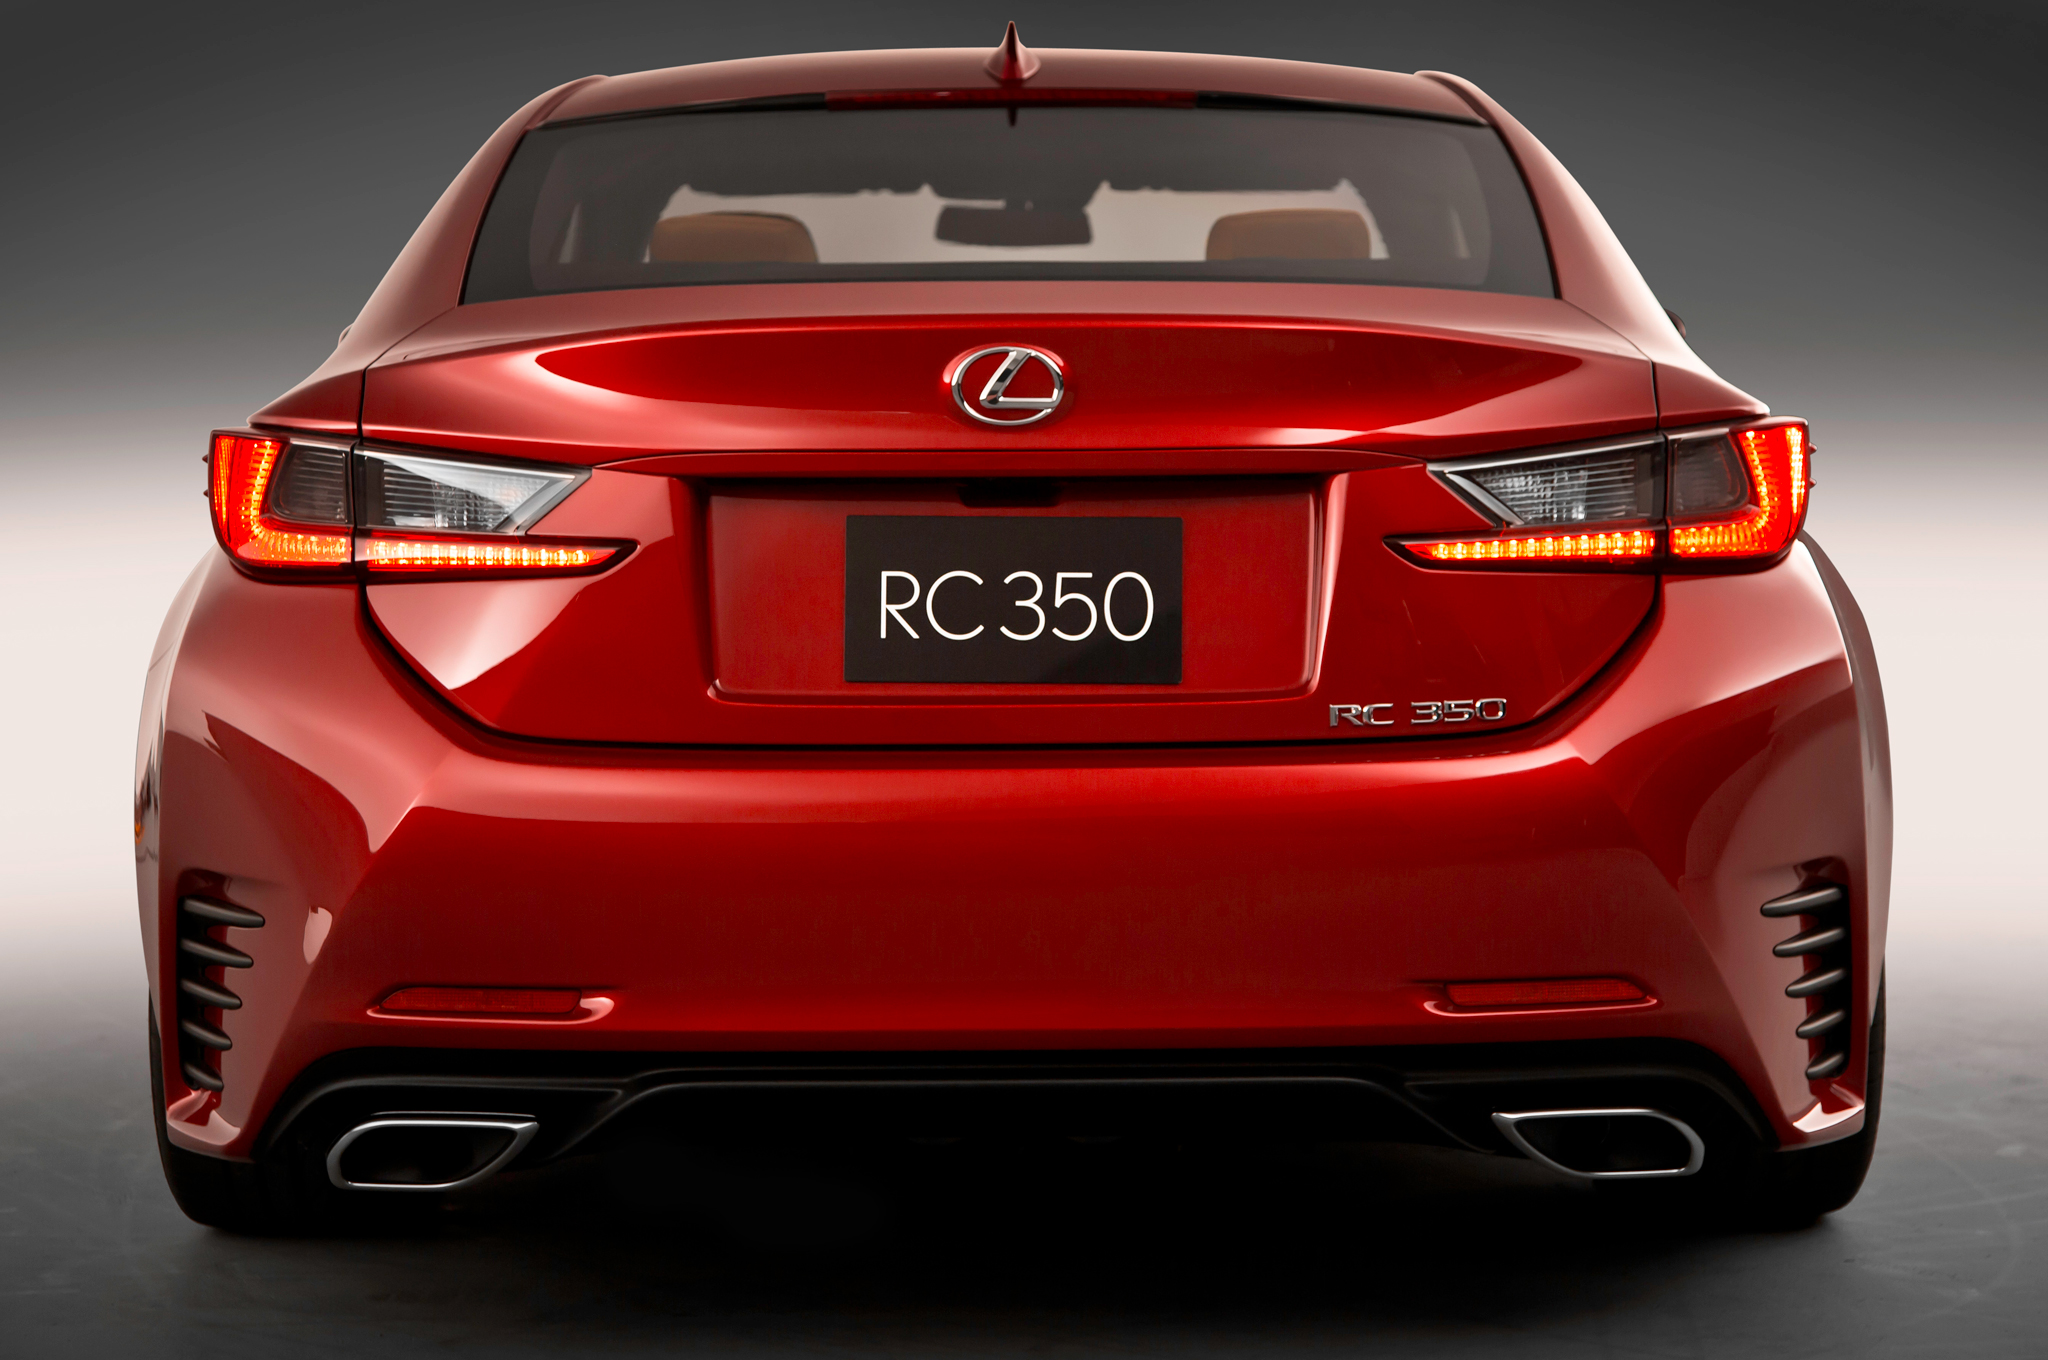 https://www.automotiveaddicts.com/wp-content/uploads/2013/11/2015-Lexus-RC-rear-view.jpg